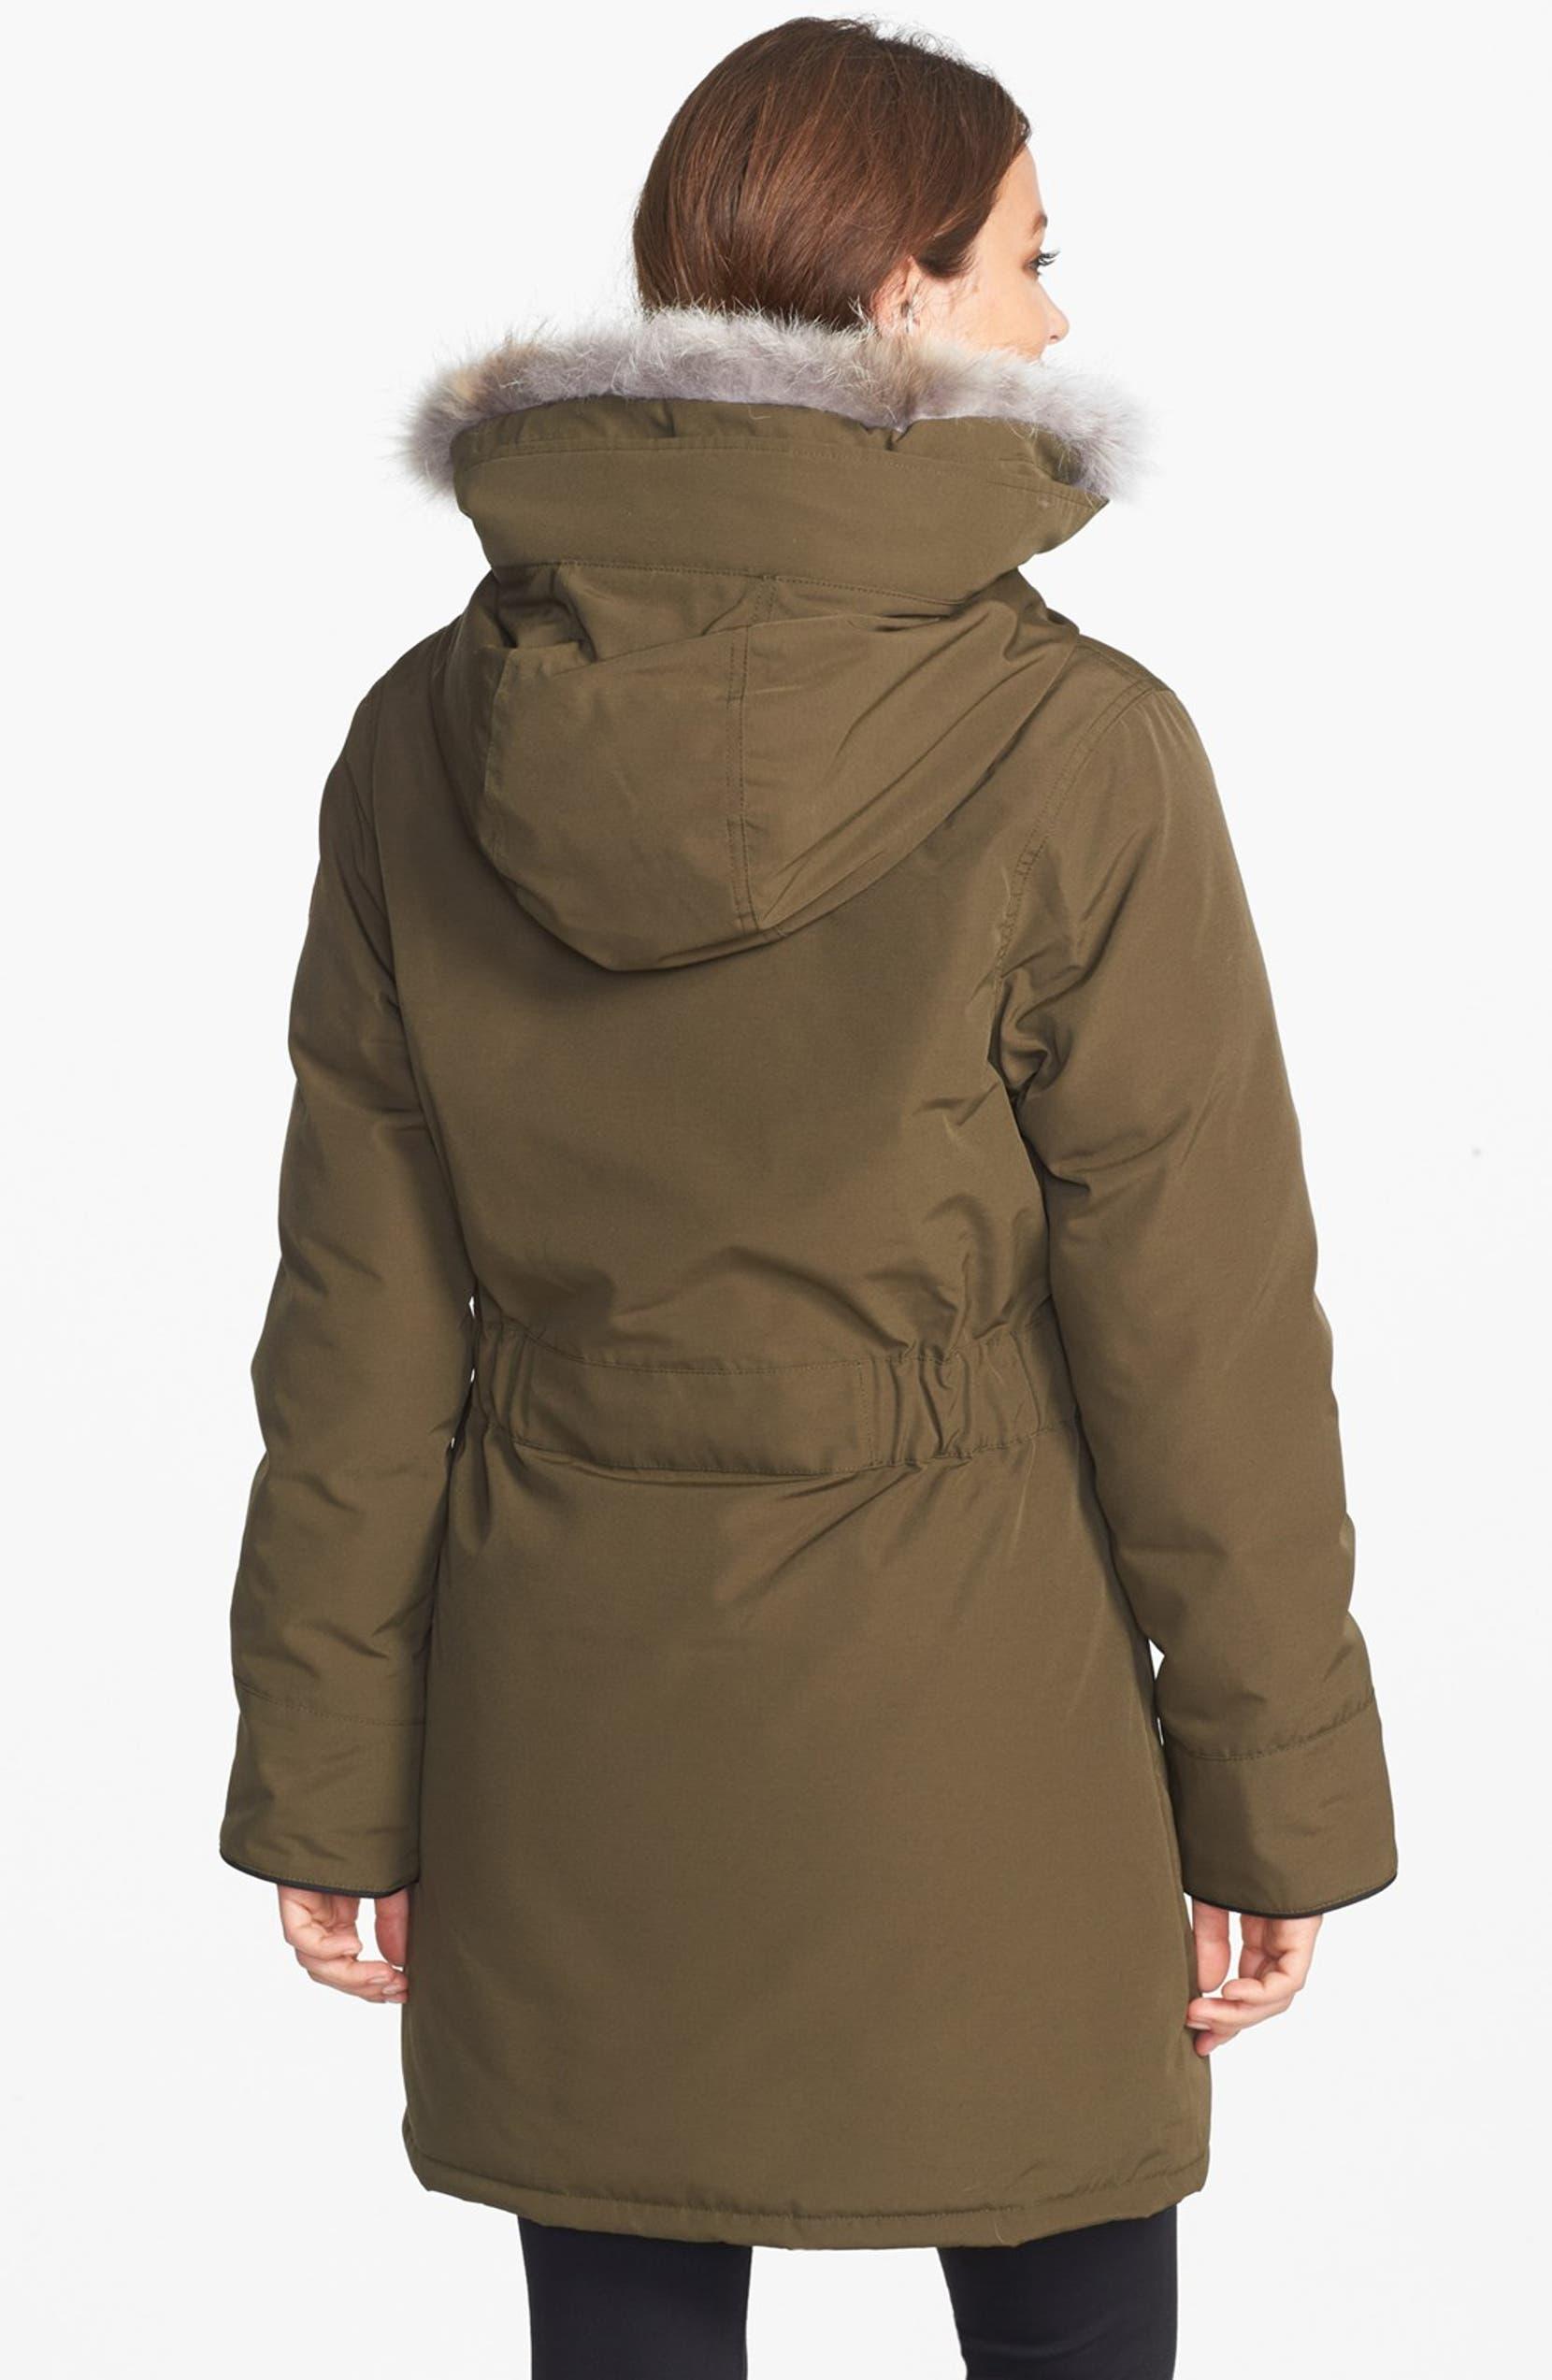 canada goose trillium parka women's style# 6550l